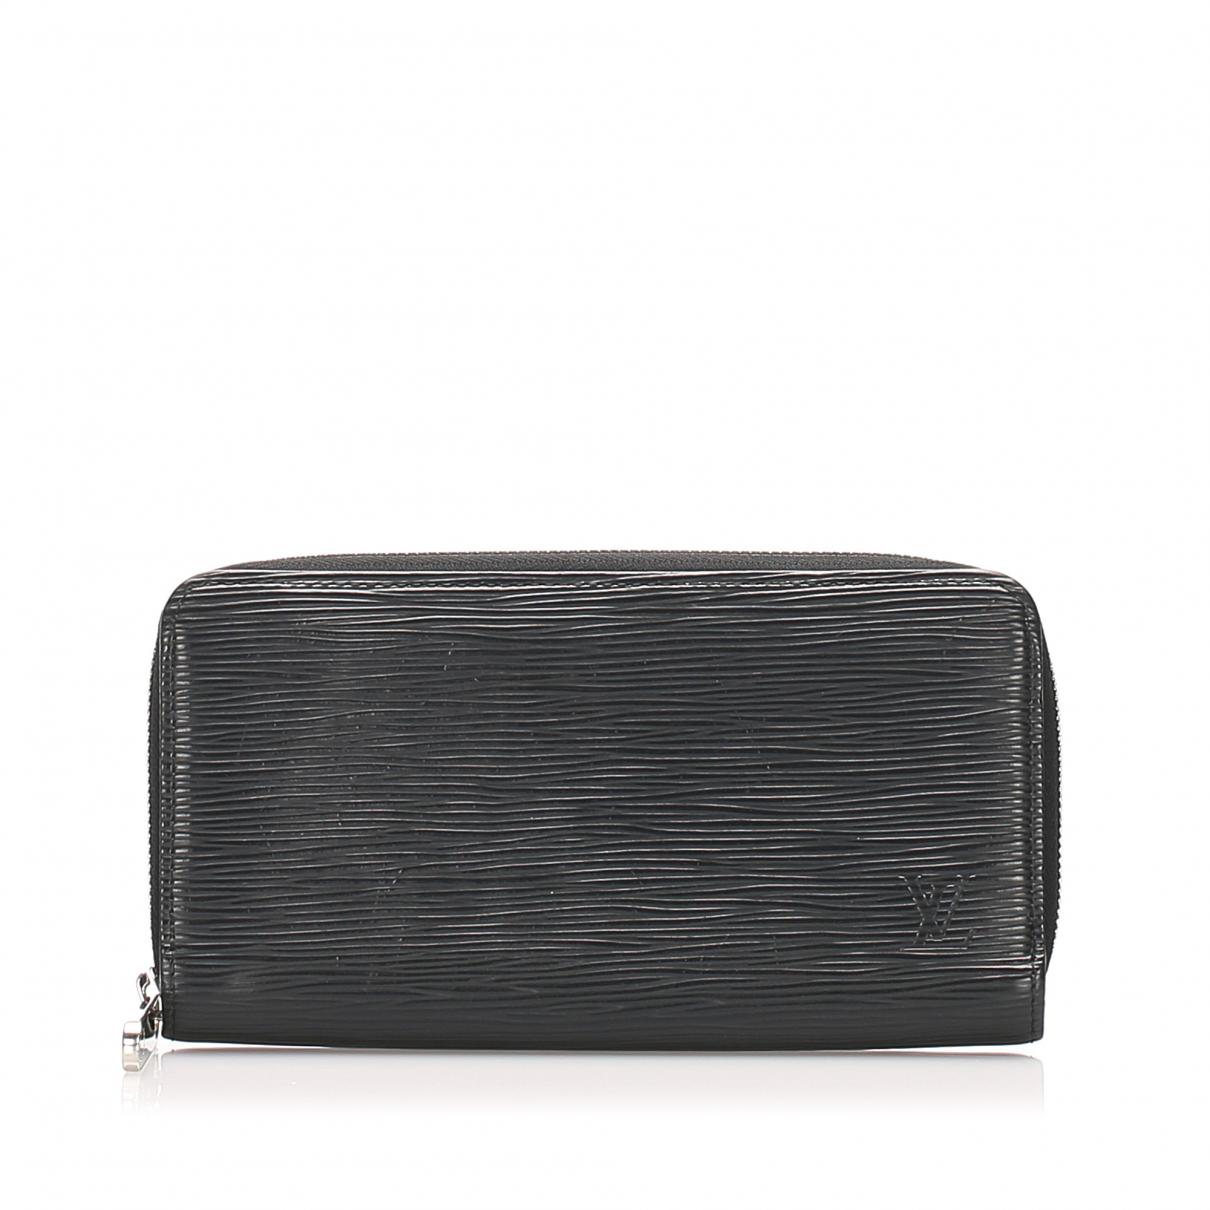 Louis Vuitton Zippy Black Leather wallet for Women \N